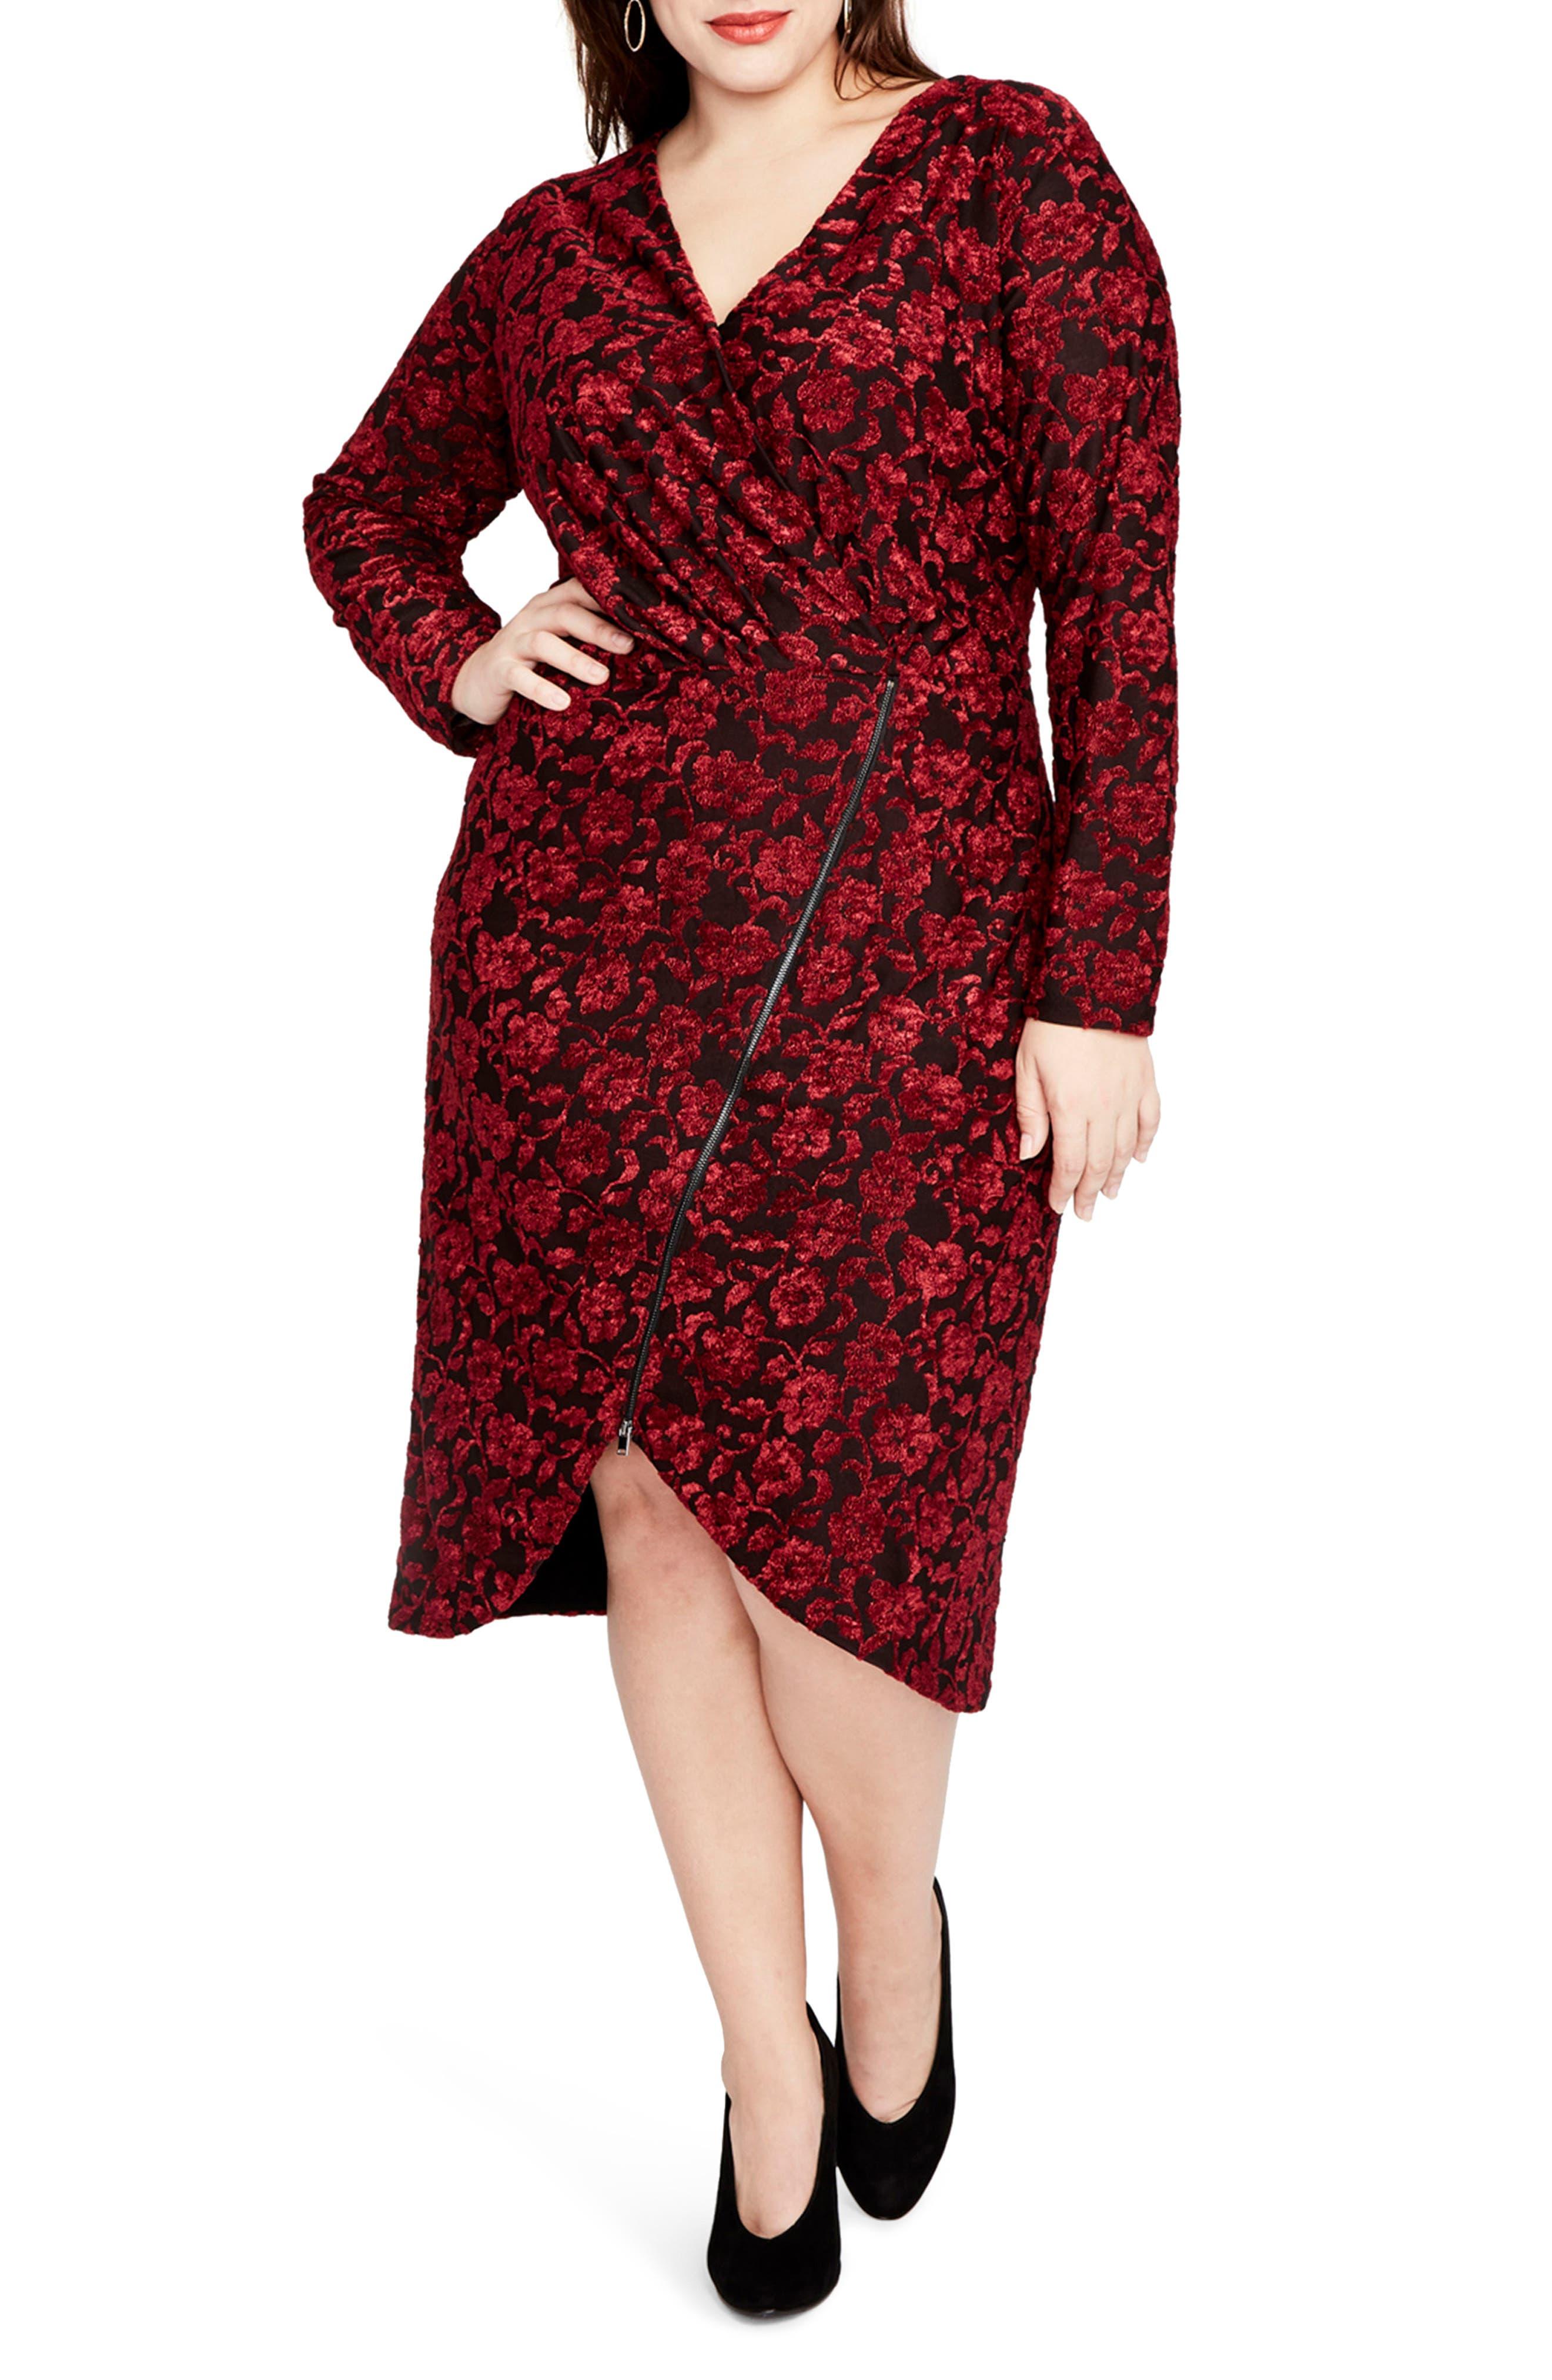 Main Image - RACHEL Rachel Roy Velvet Floral Zip Front Dress (Plus Size)